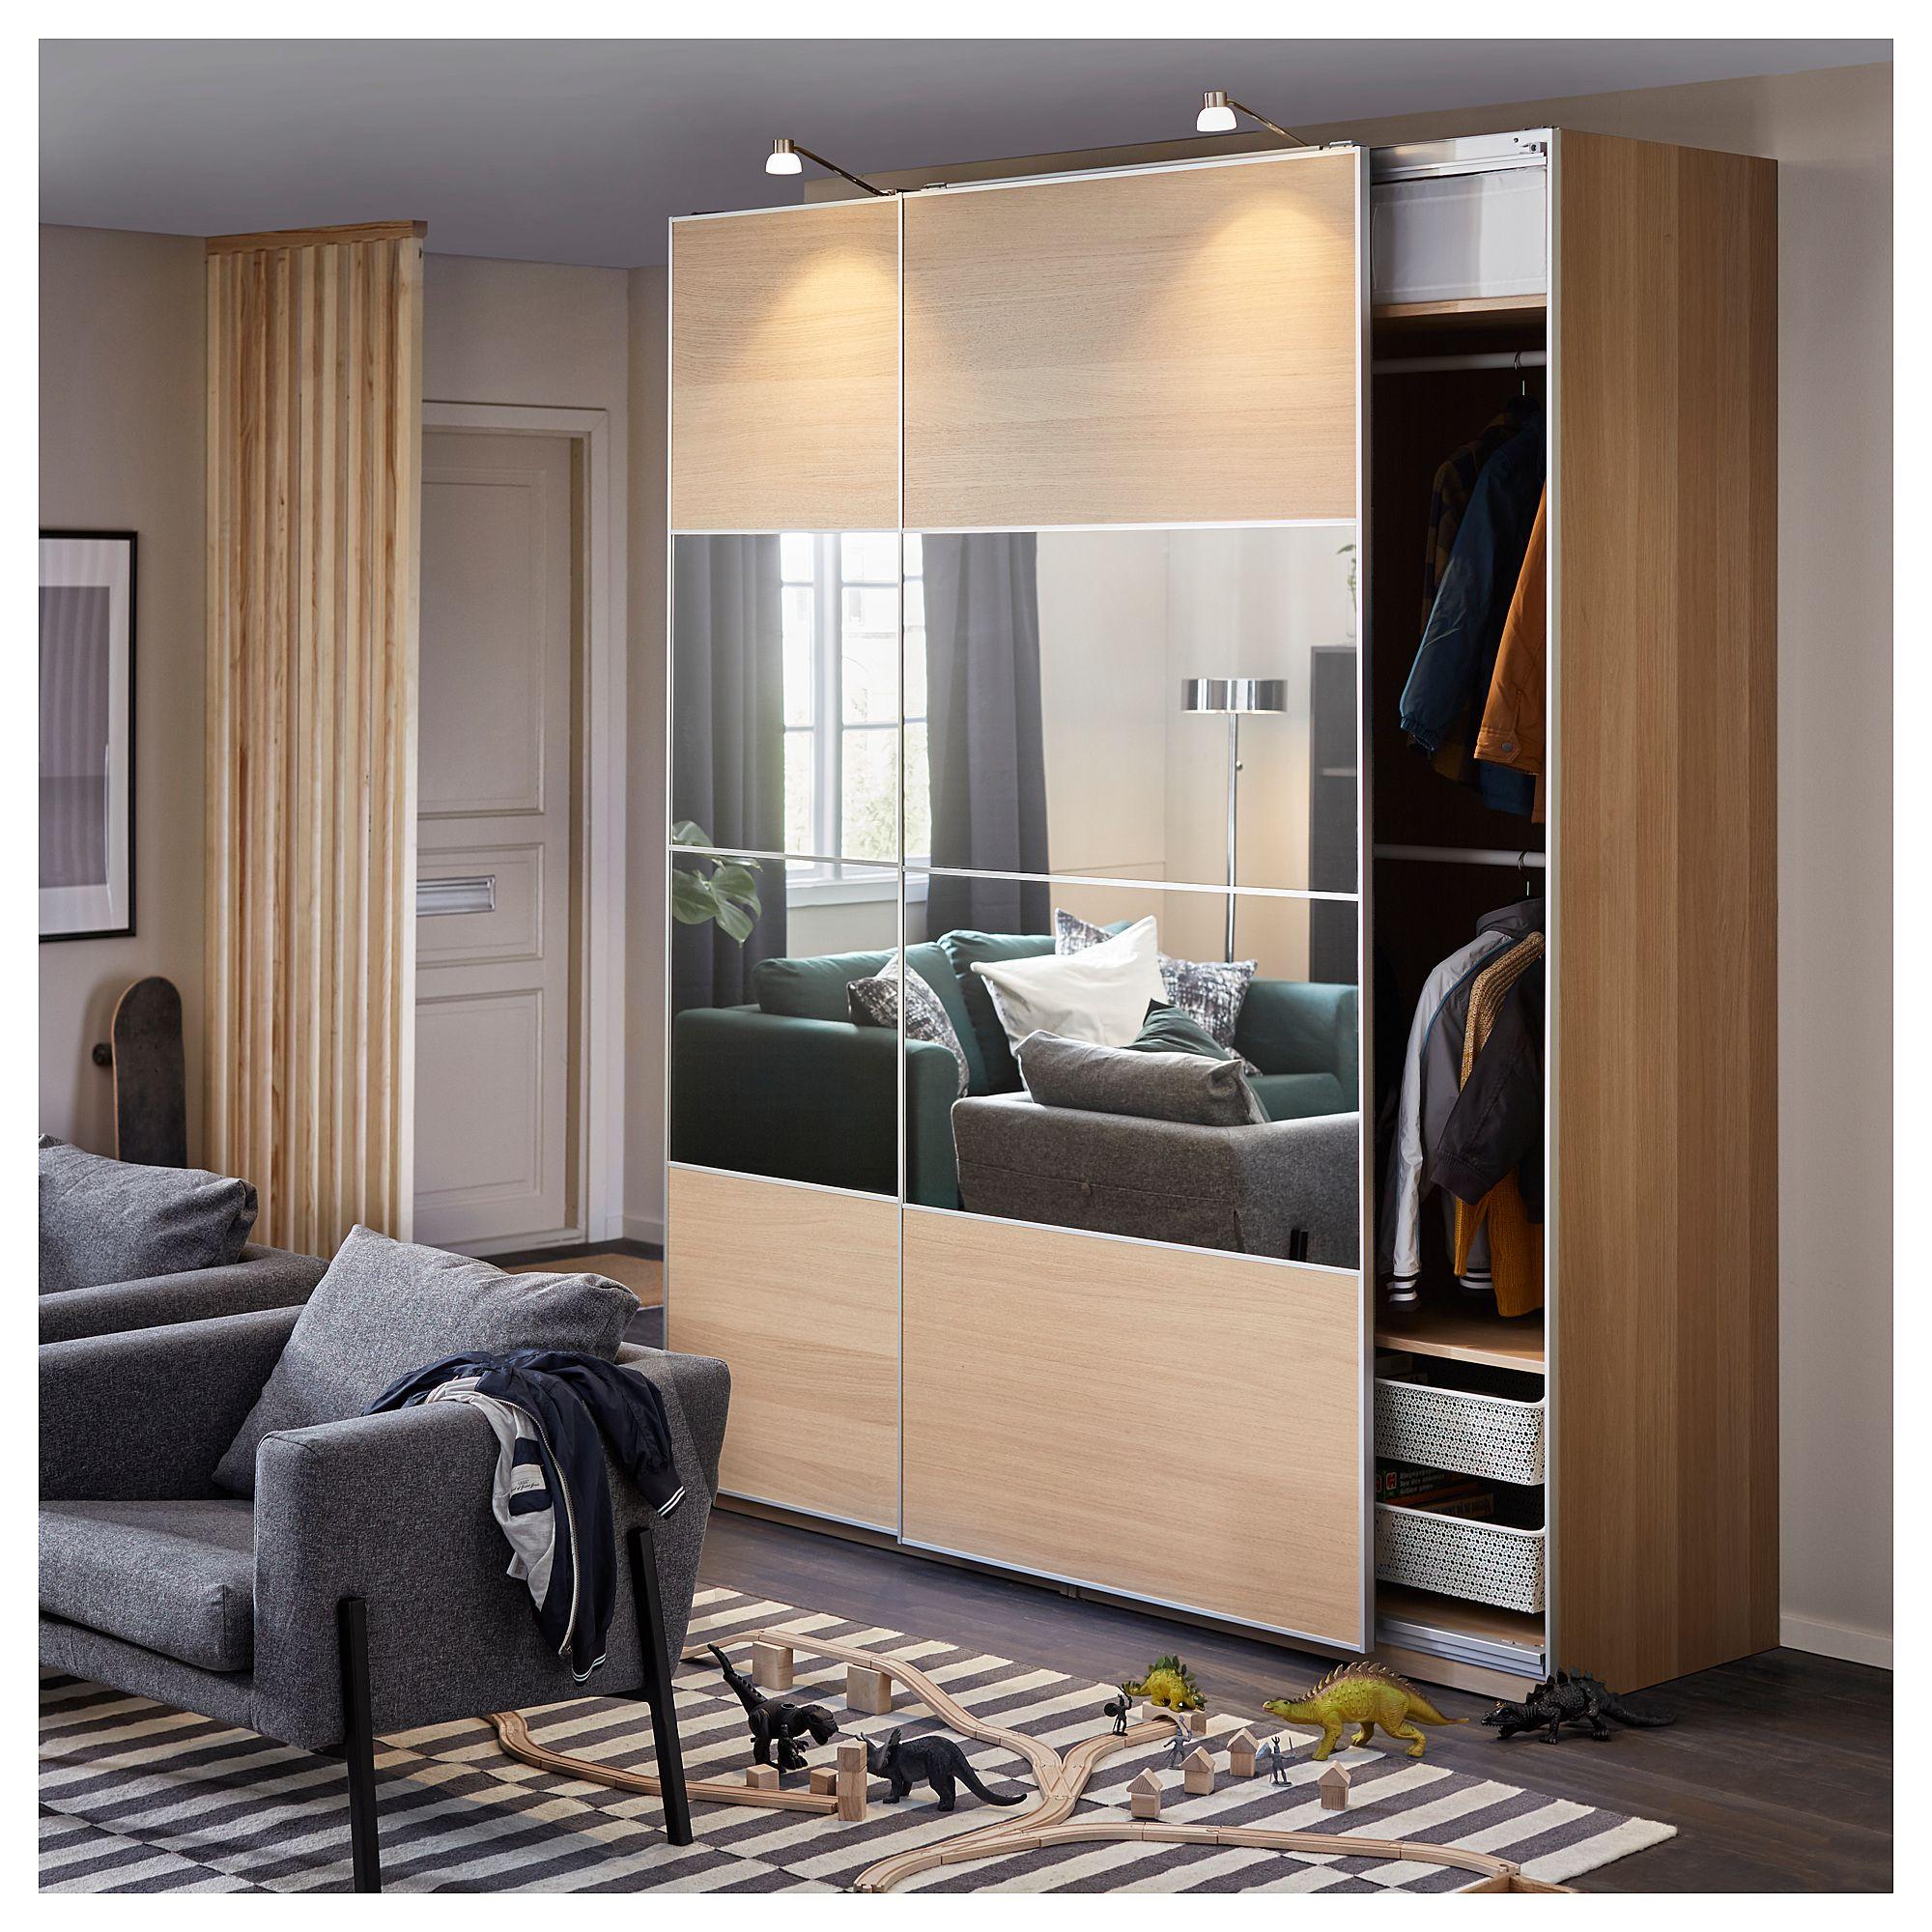 Furniture Home Furnishings Find Your Inspiration Ikea Sliding Door Ikea Pax Furniture